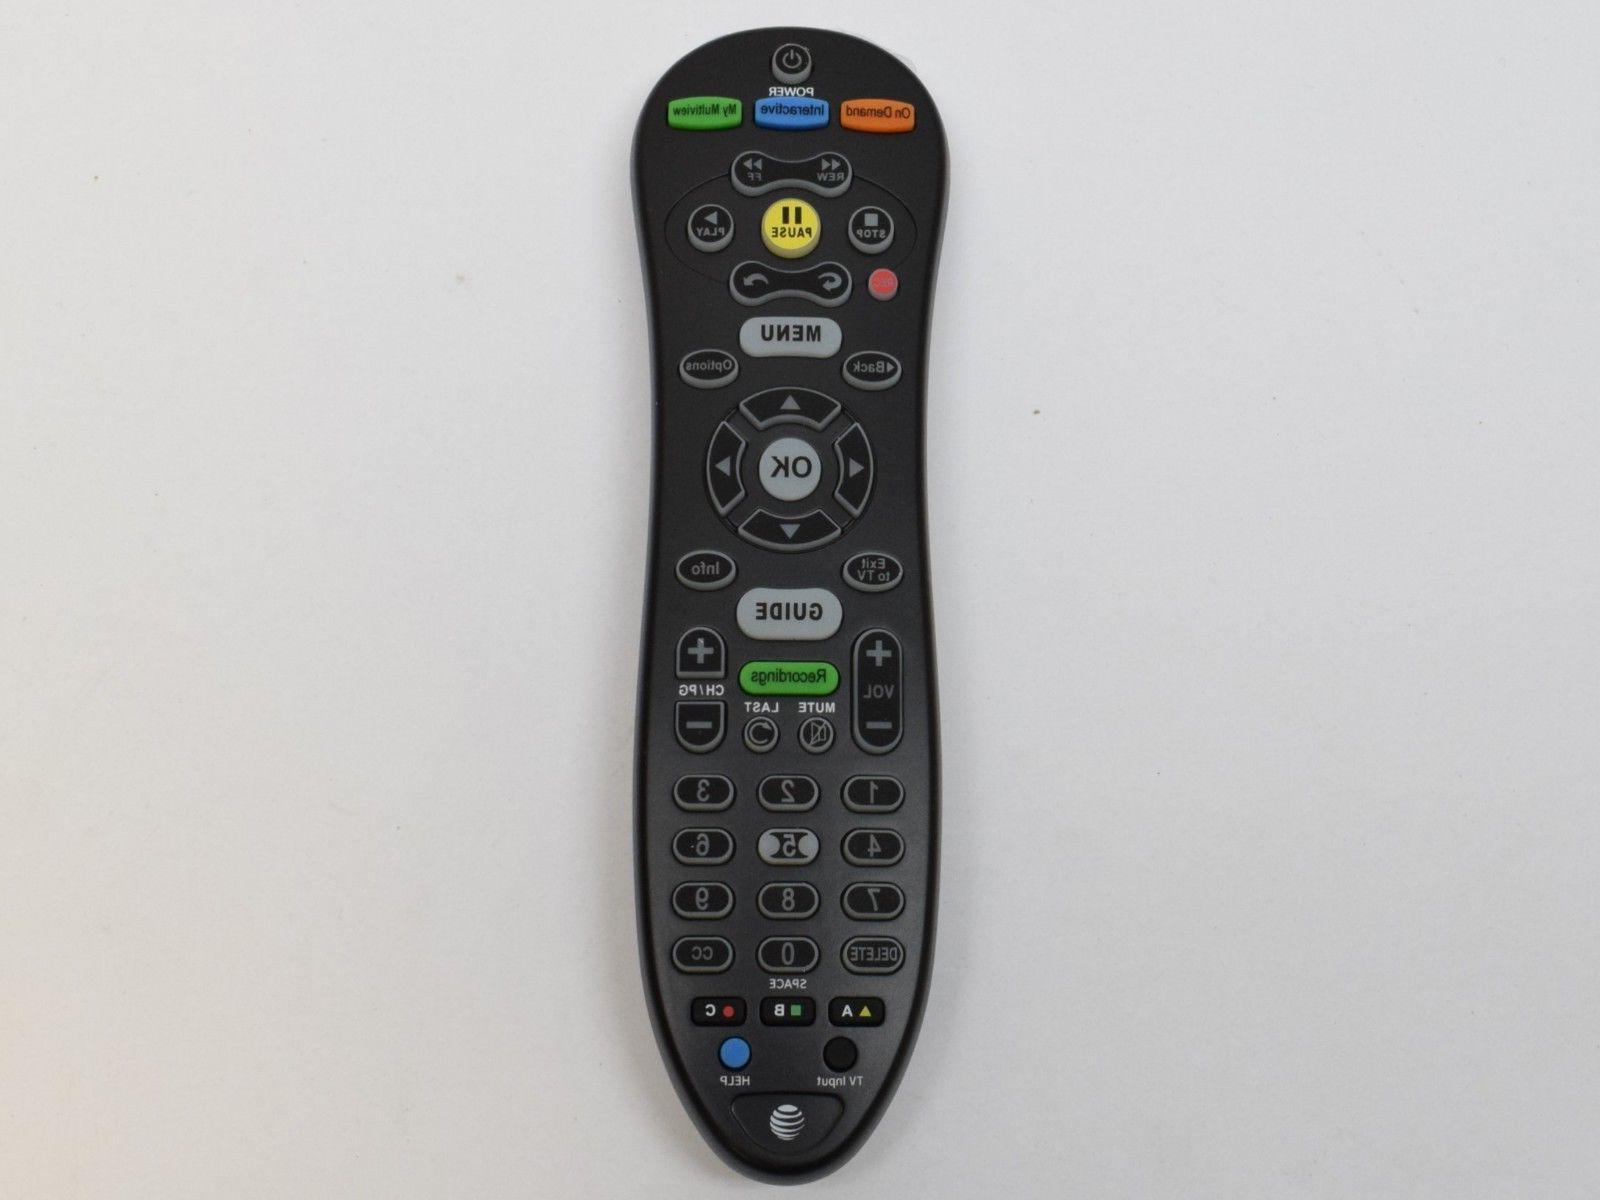 New AT&T S30-S1A U-VERSE Standard Programmable Universal Rem